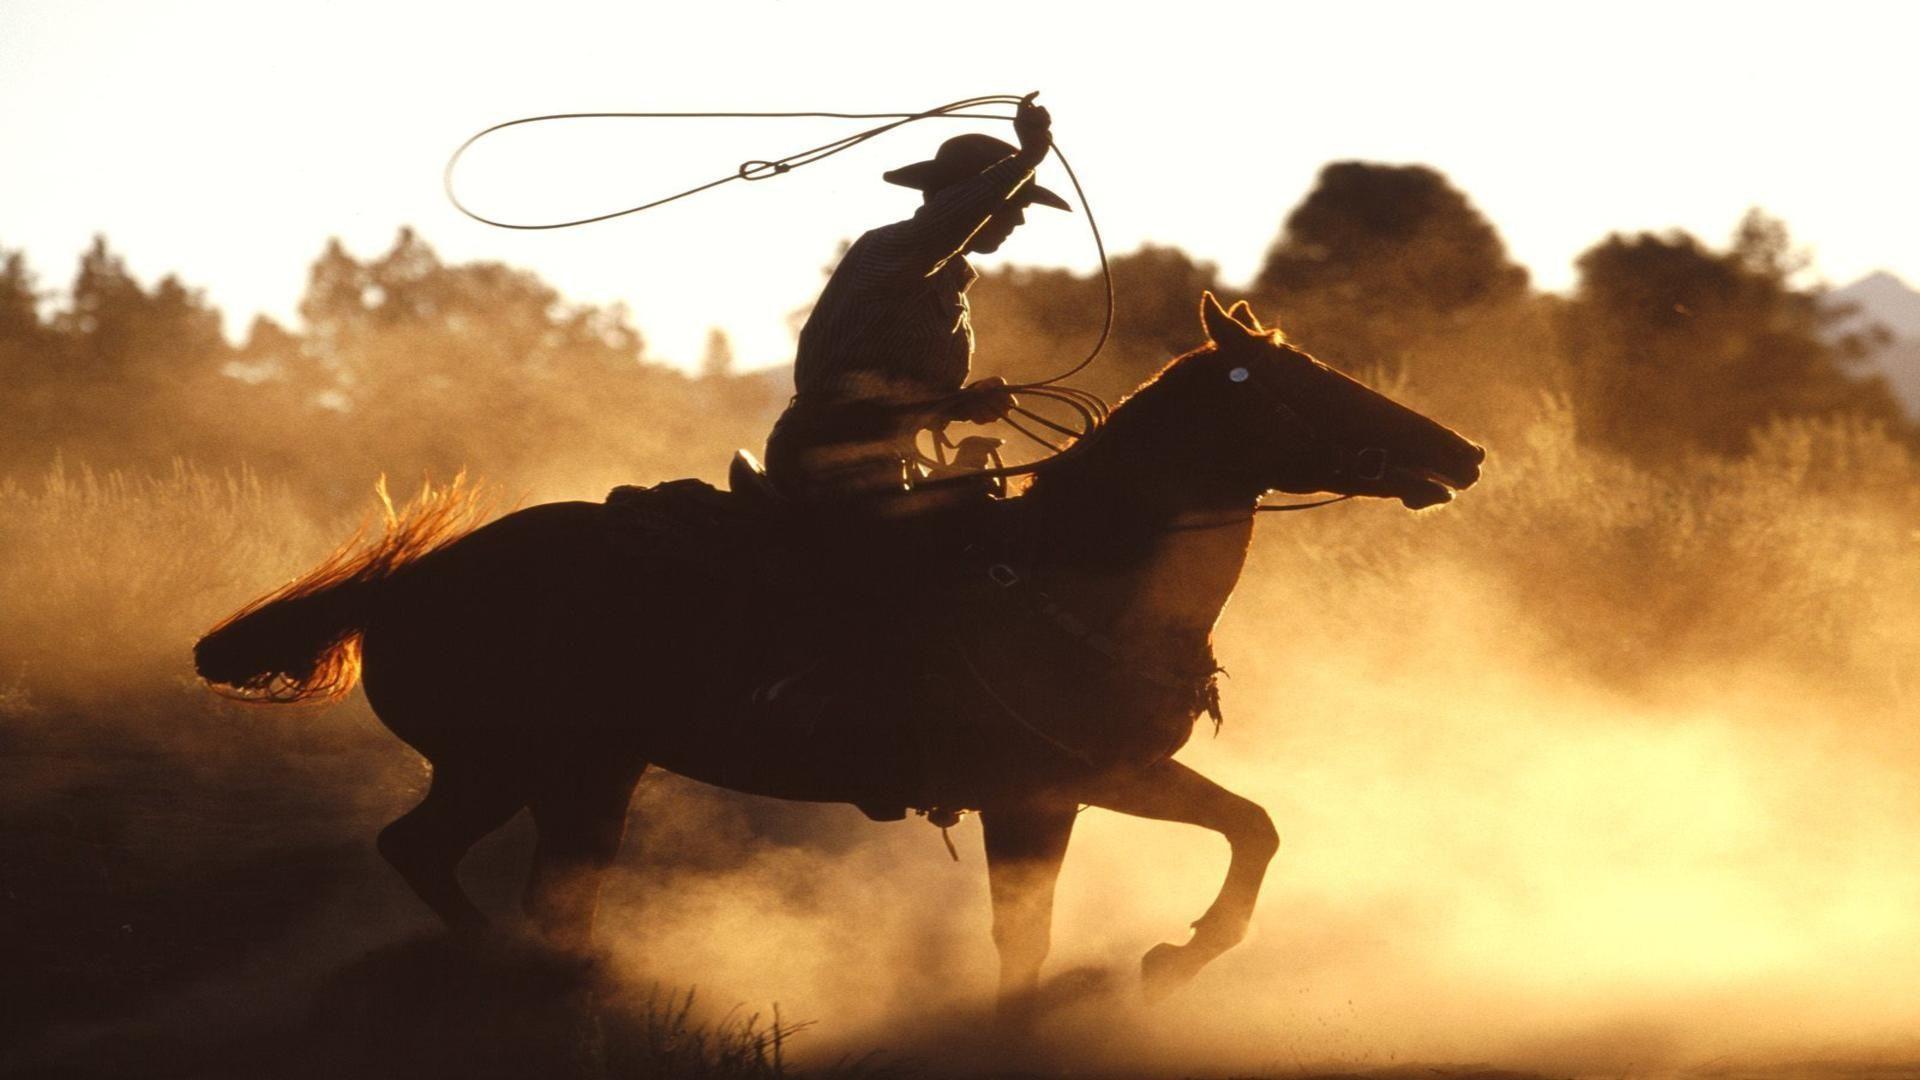 Western Cowboy Wallpaper